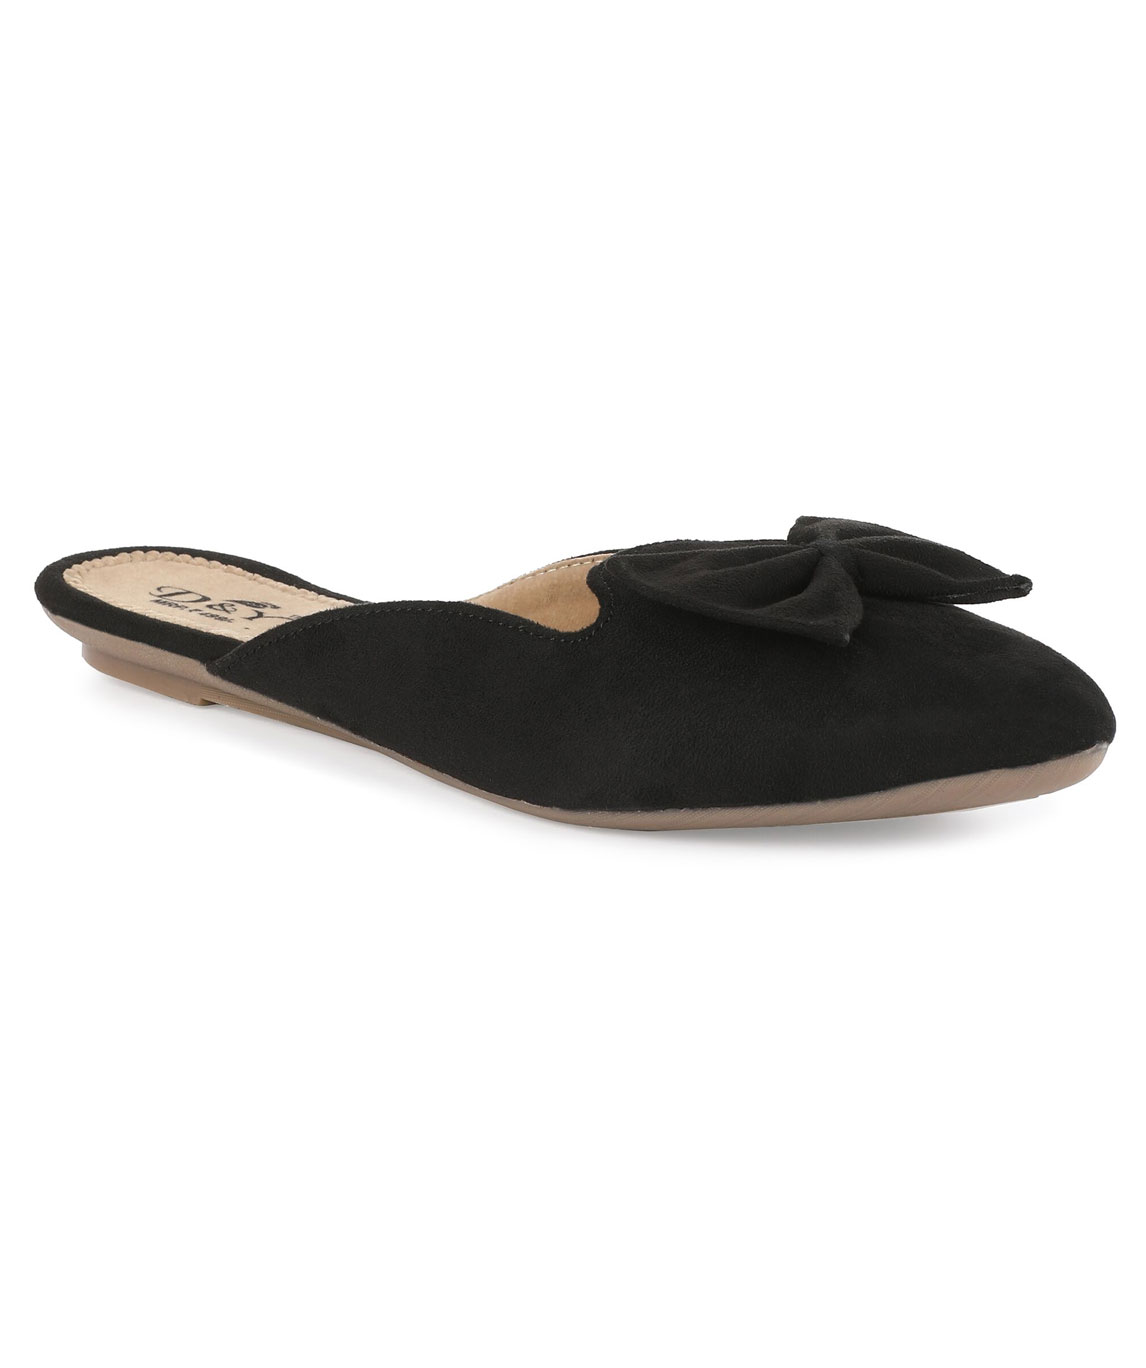 Sindhi Footwear Women`s Black Rexin Casual Ballerinas